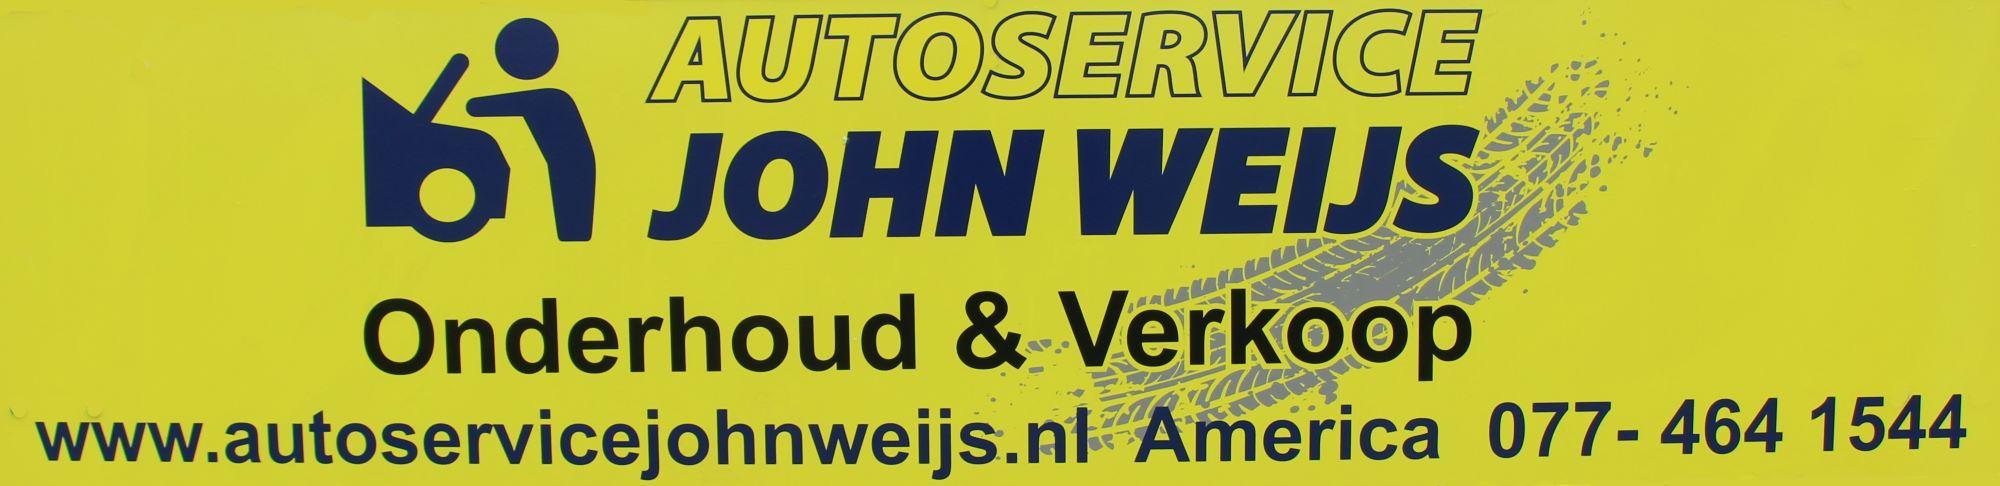 bord_JohnWeijs